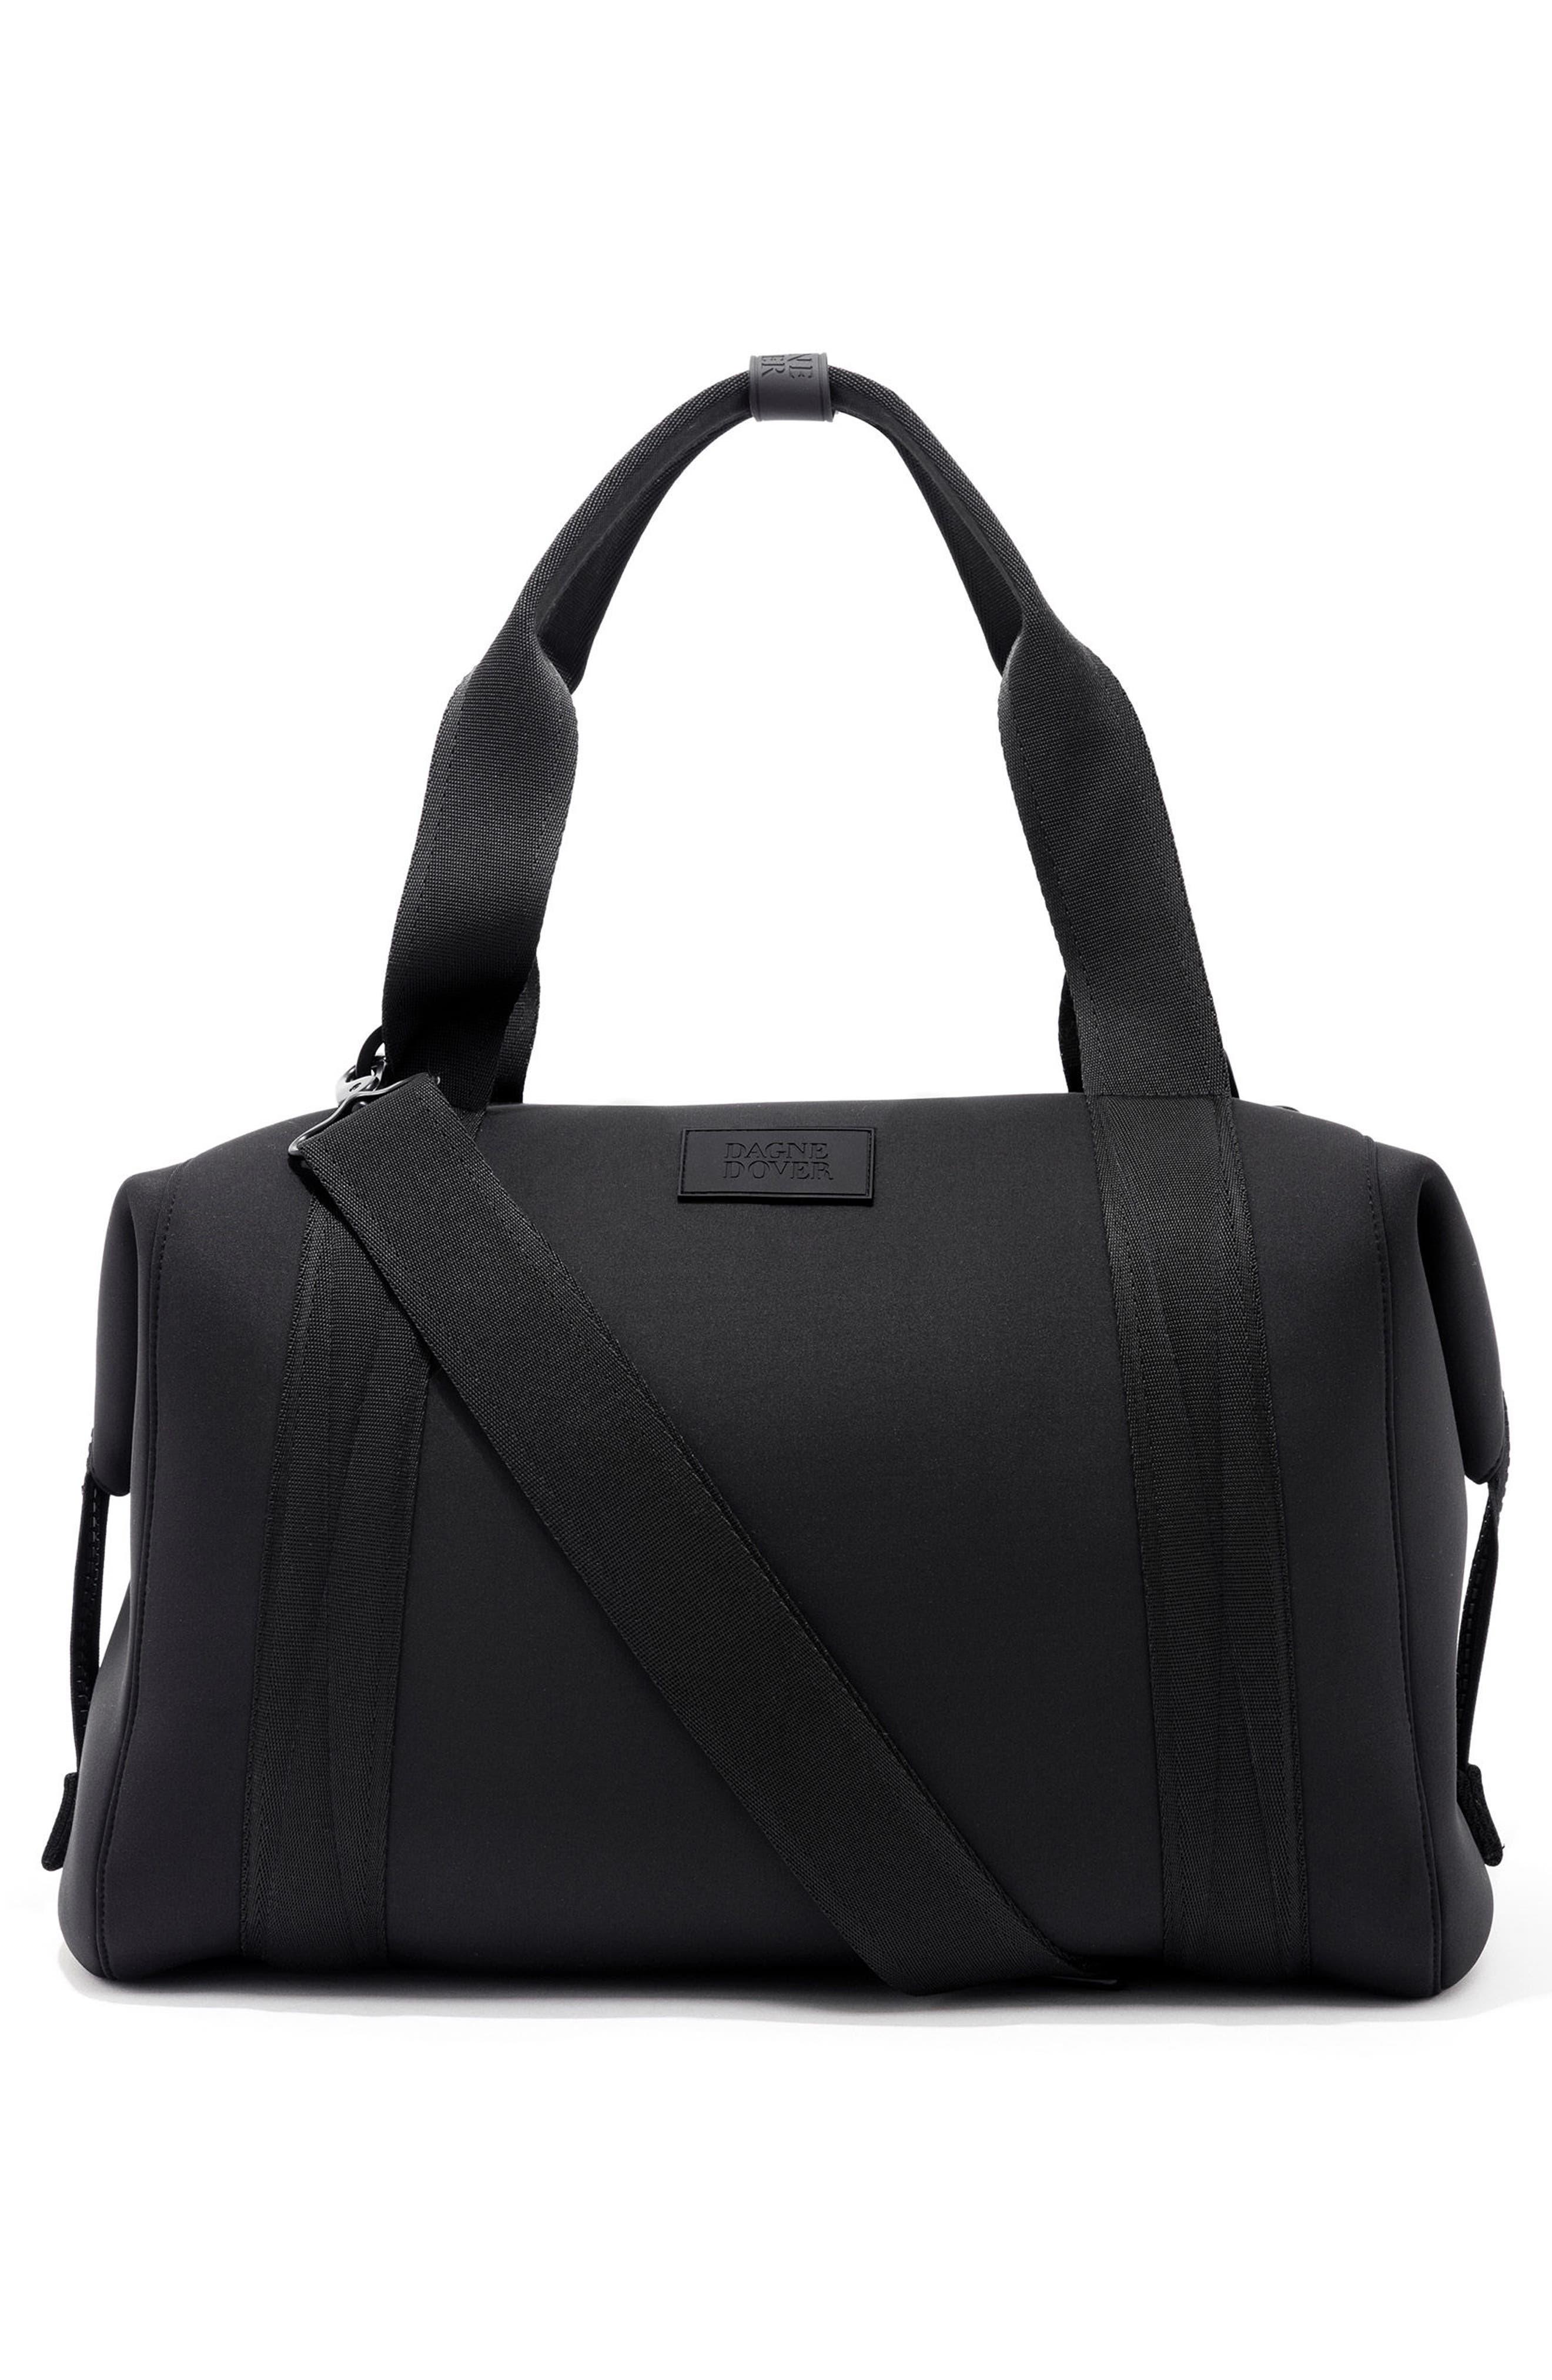 365 Large Landon Neoprene Carryall Duffel Bag,                             Alternate thumbnail 19, color,